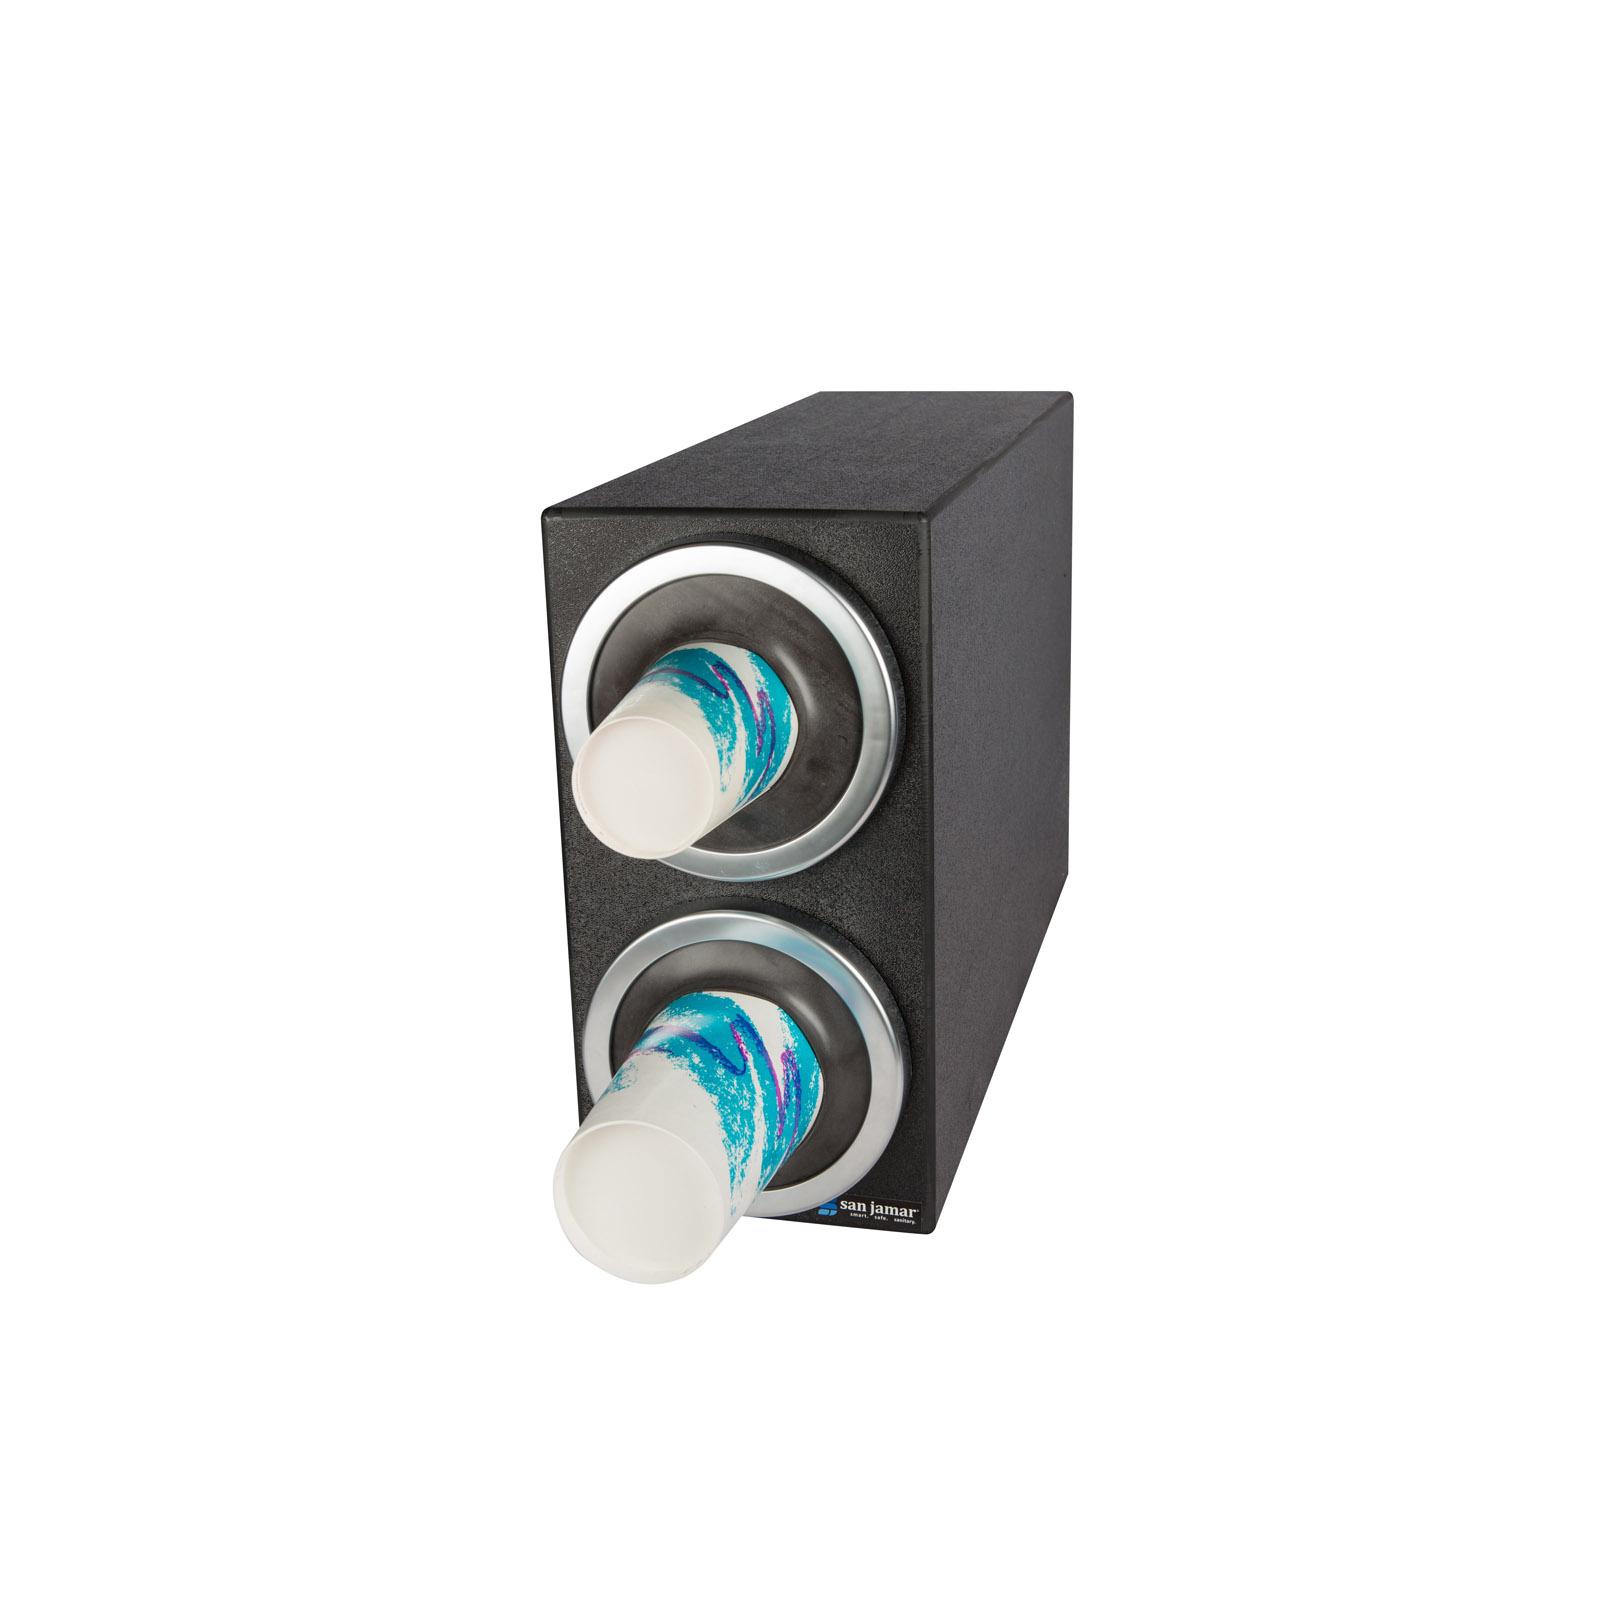 San Jamar C2902 cup dispensers, countertop